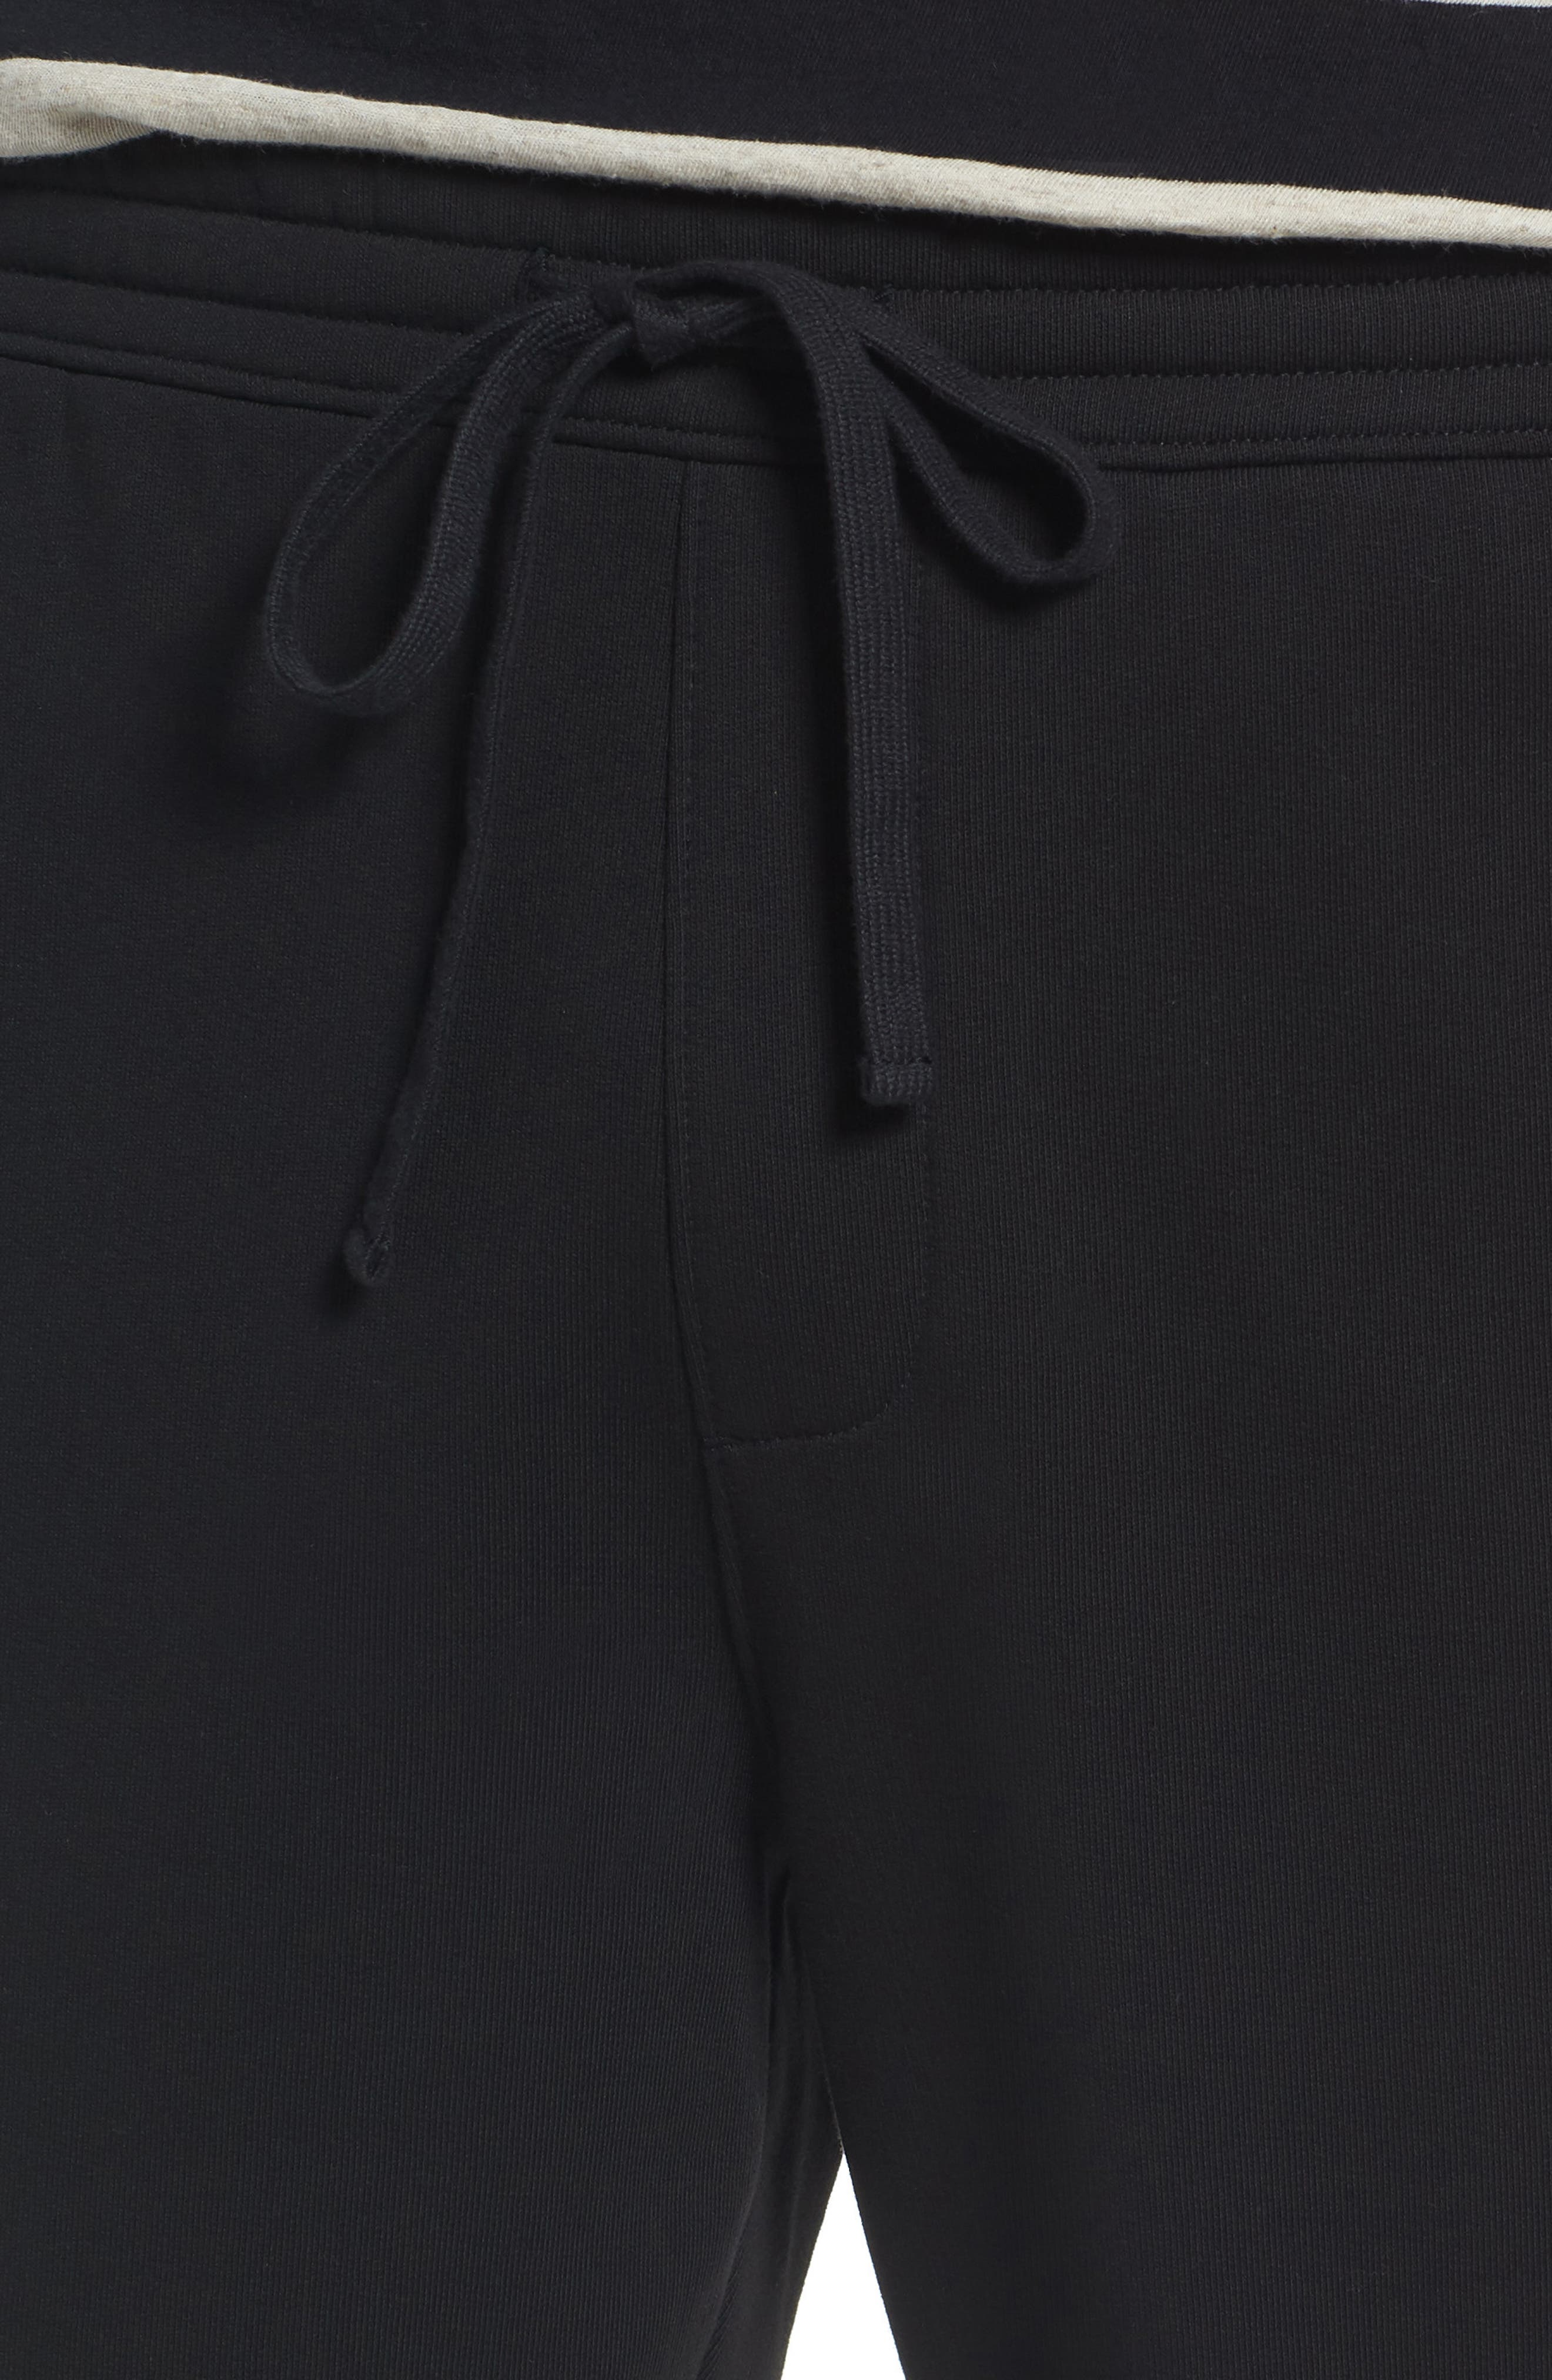 Mix Media Regular Fit Cotton Sweatpants,                             Alternate thumbnail 4, color,                             Black